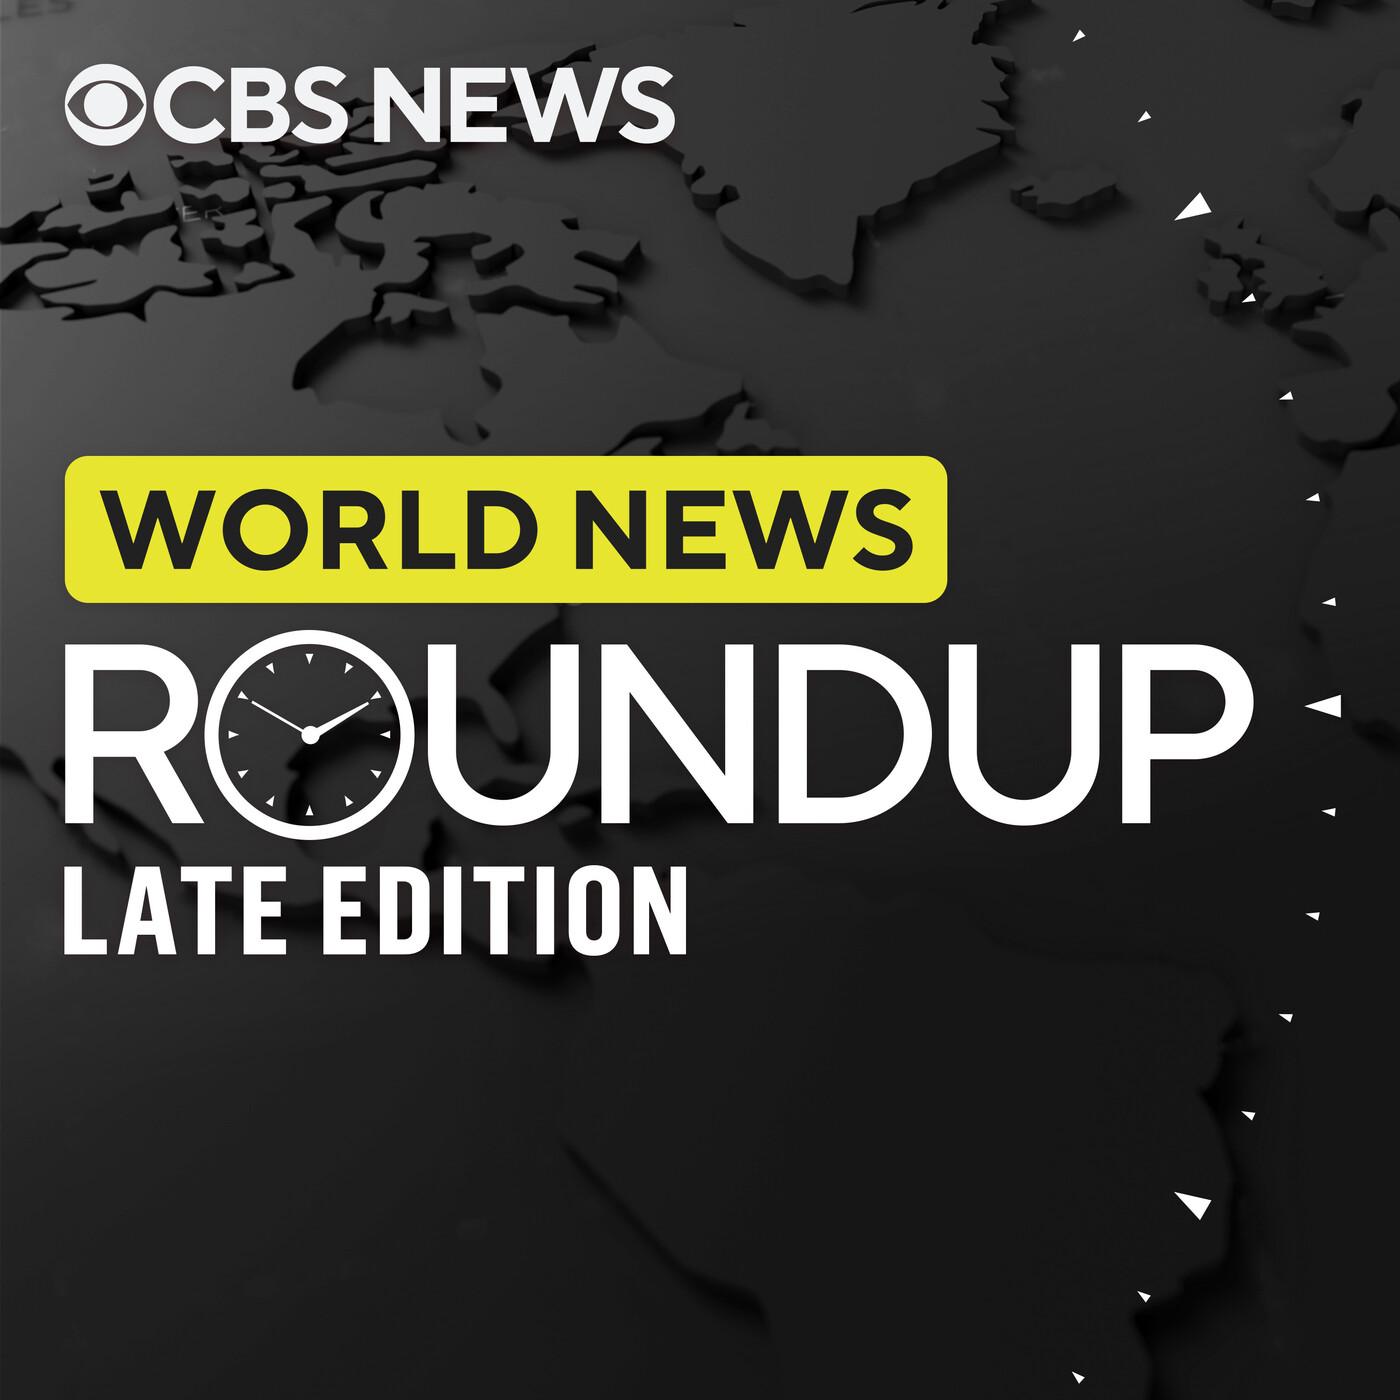 World news roundup late edition, 10/20